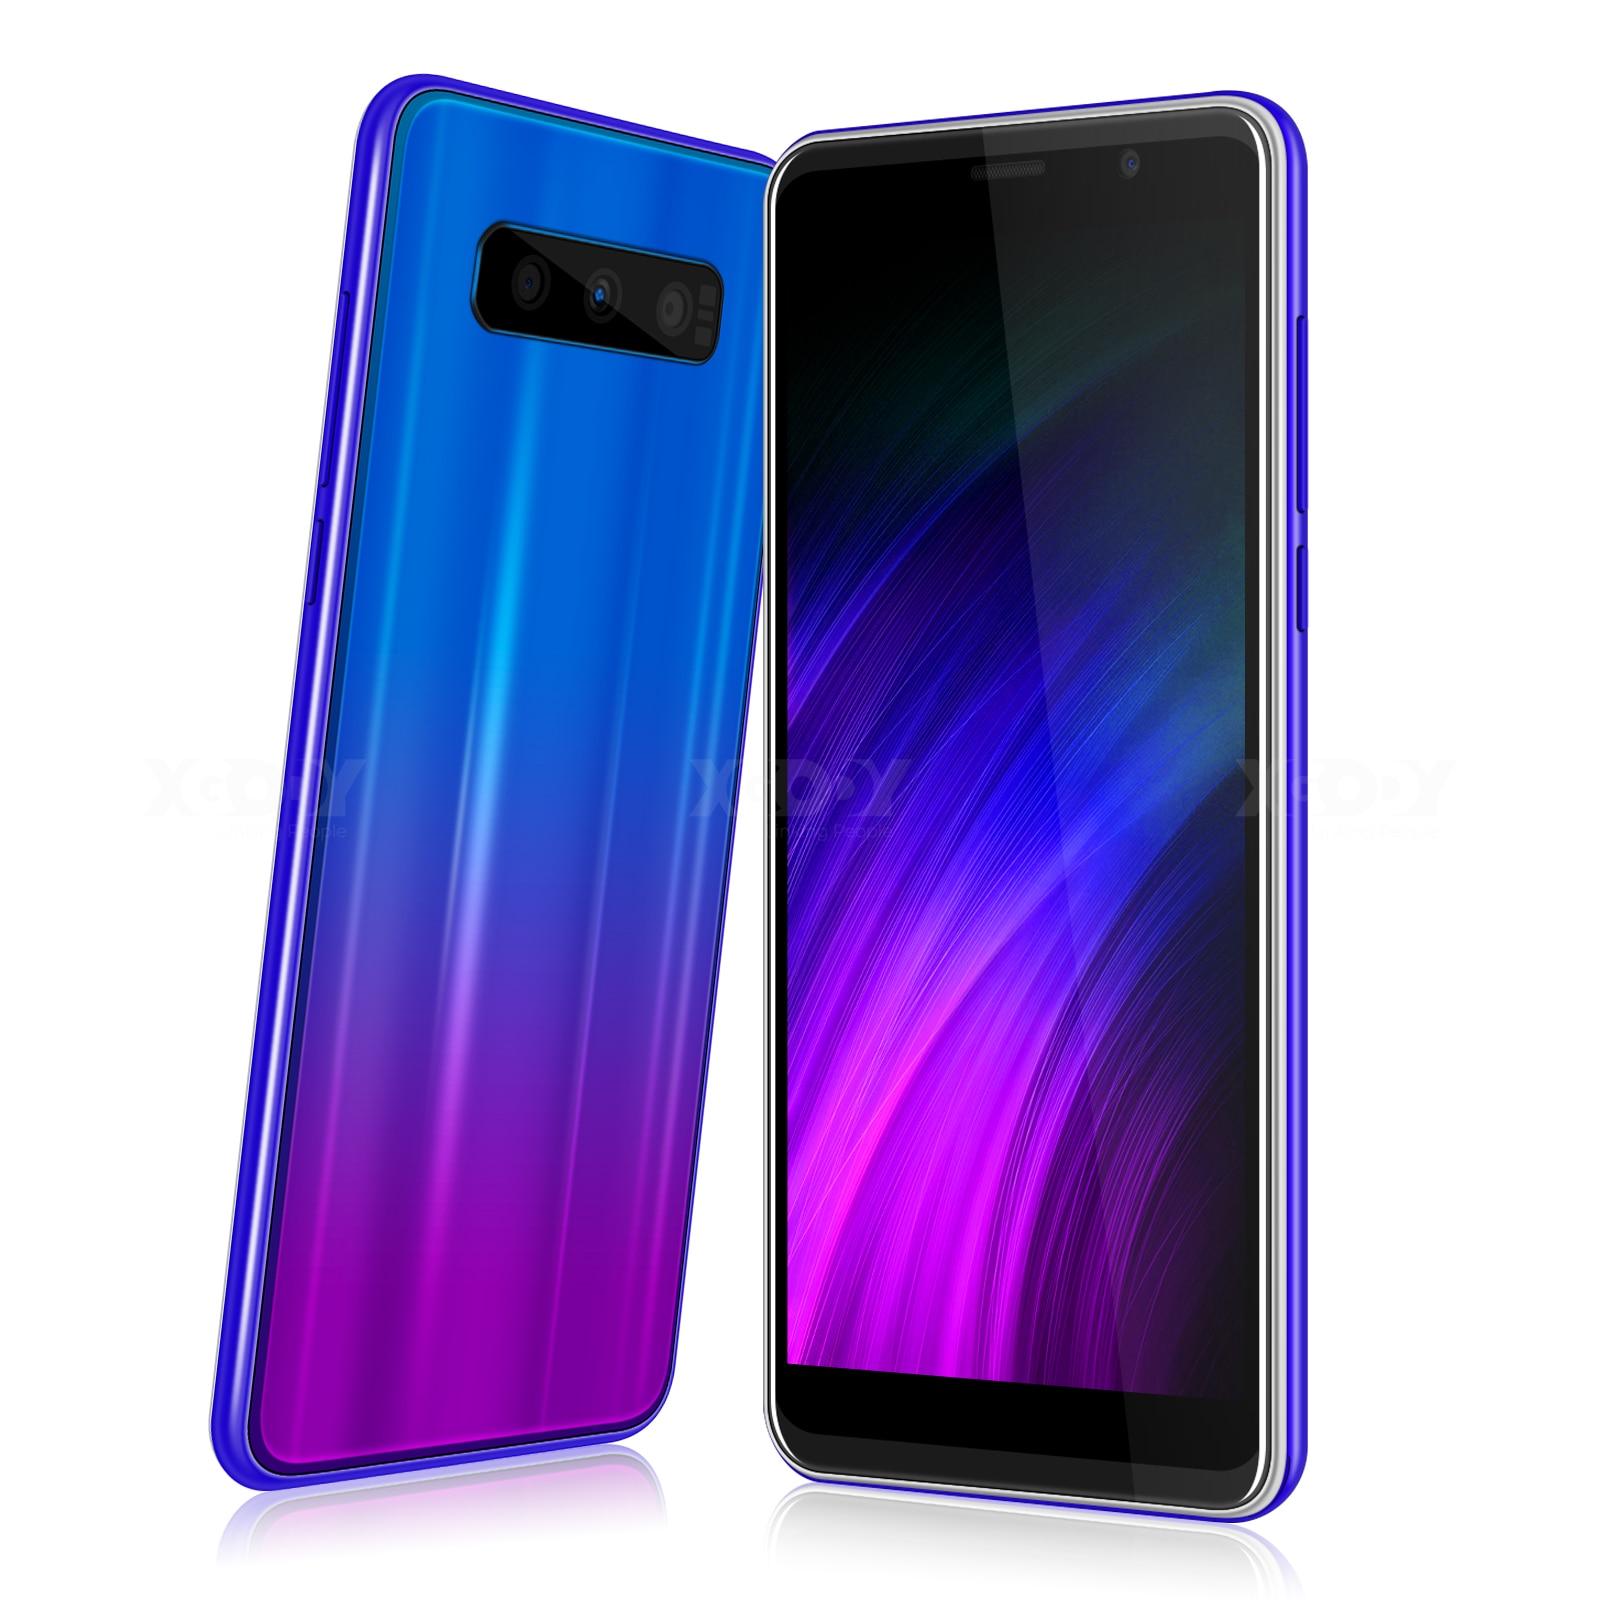 Фото. XGODY S10 5,5 дюйма 3g смартфон 18:9 Оперативная память 2 Гб Встроенная память 16 Гб MT6580 4 ядра д